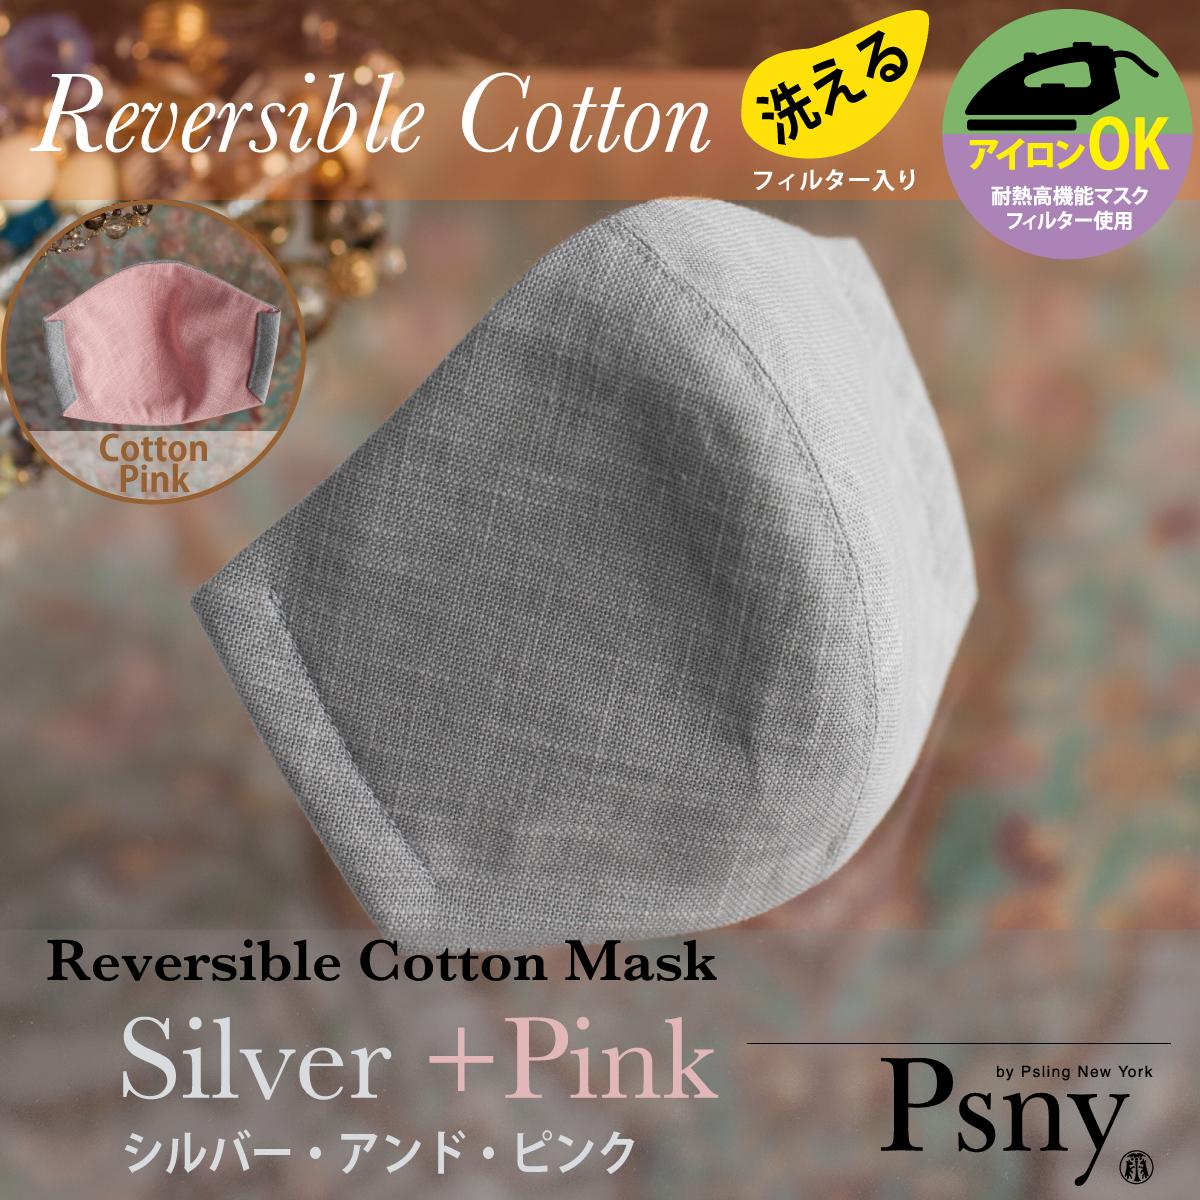 PSNY ベーシックコットン・シルバー(&ピンク) 花粉 黄砂 洗えるフィルター入り 立体 マスク 大人用 CC3